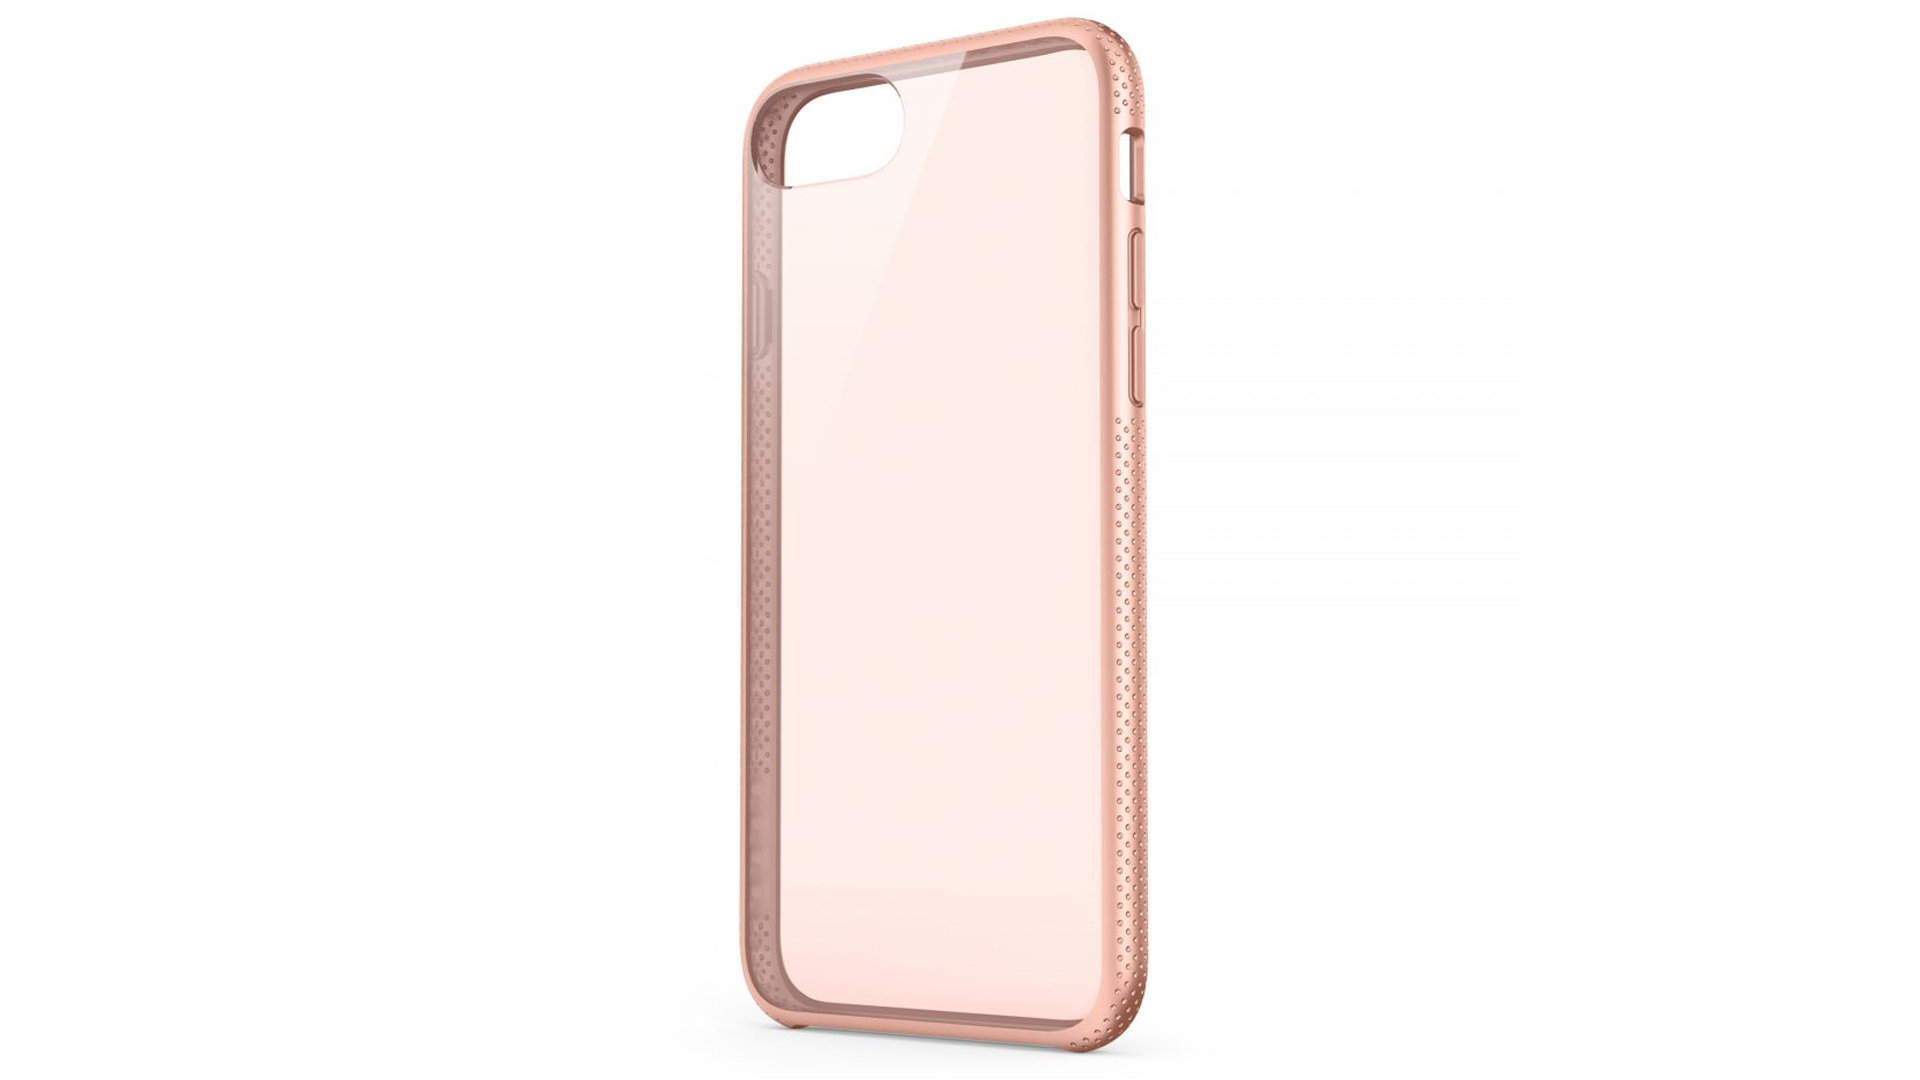 9KQLJsZZzyCTAvhPPk6dFP - The best iPhone 7 Plus cases